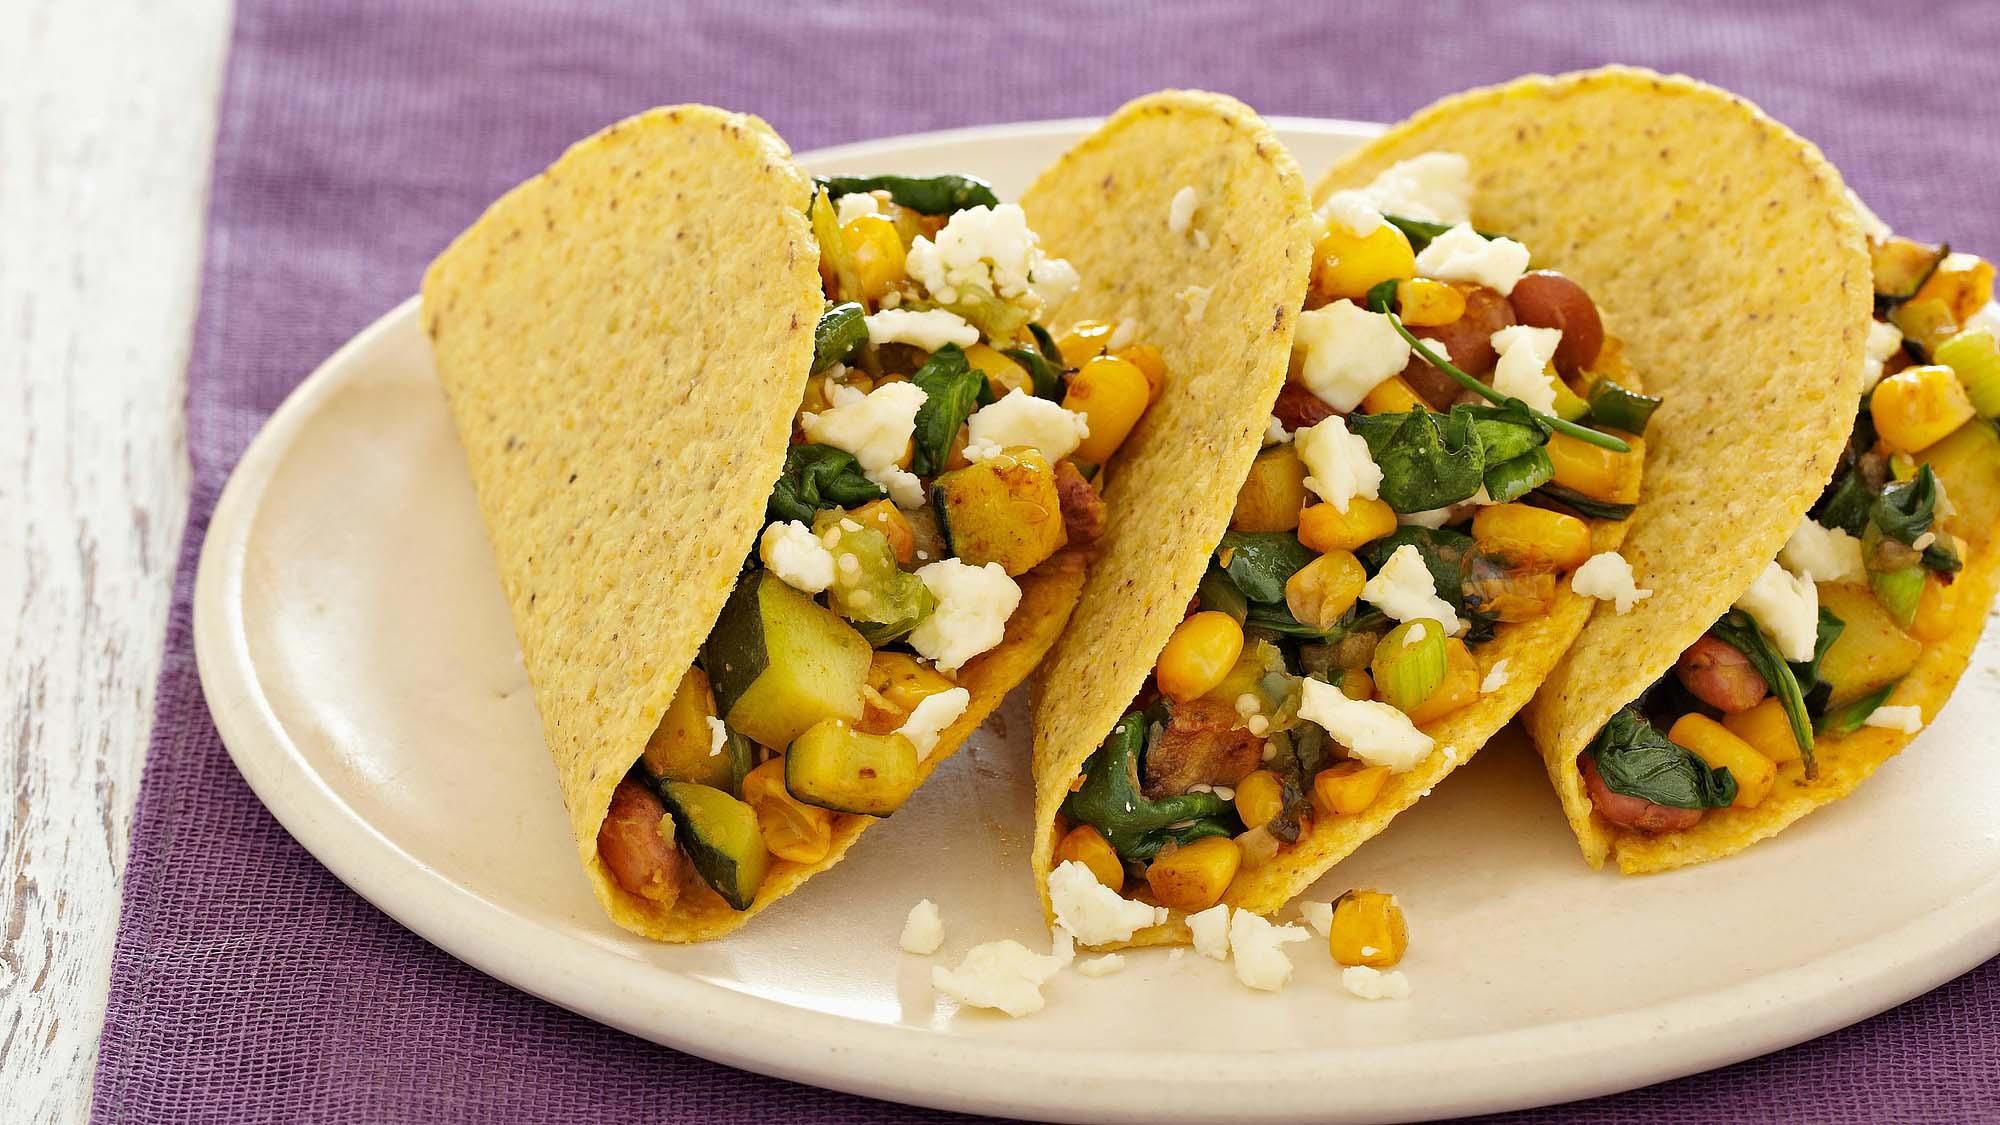 McCormick Vegetarian Tacos